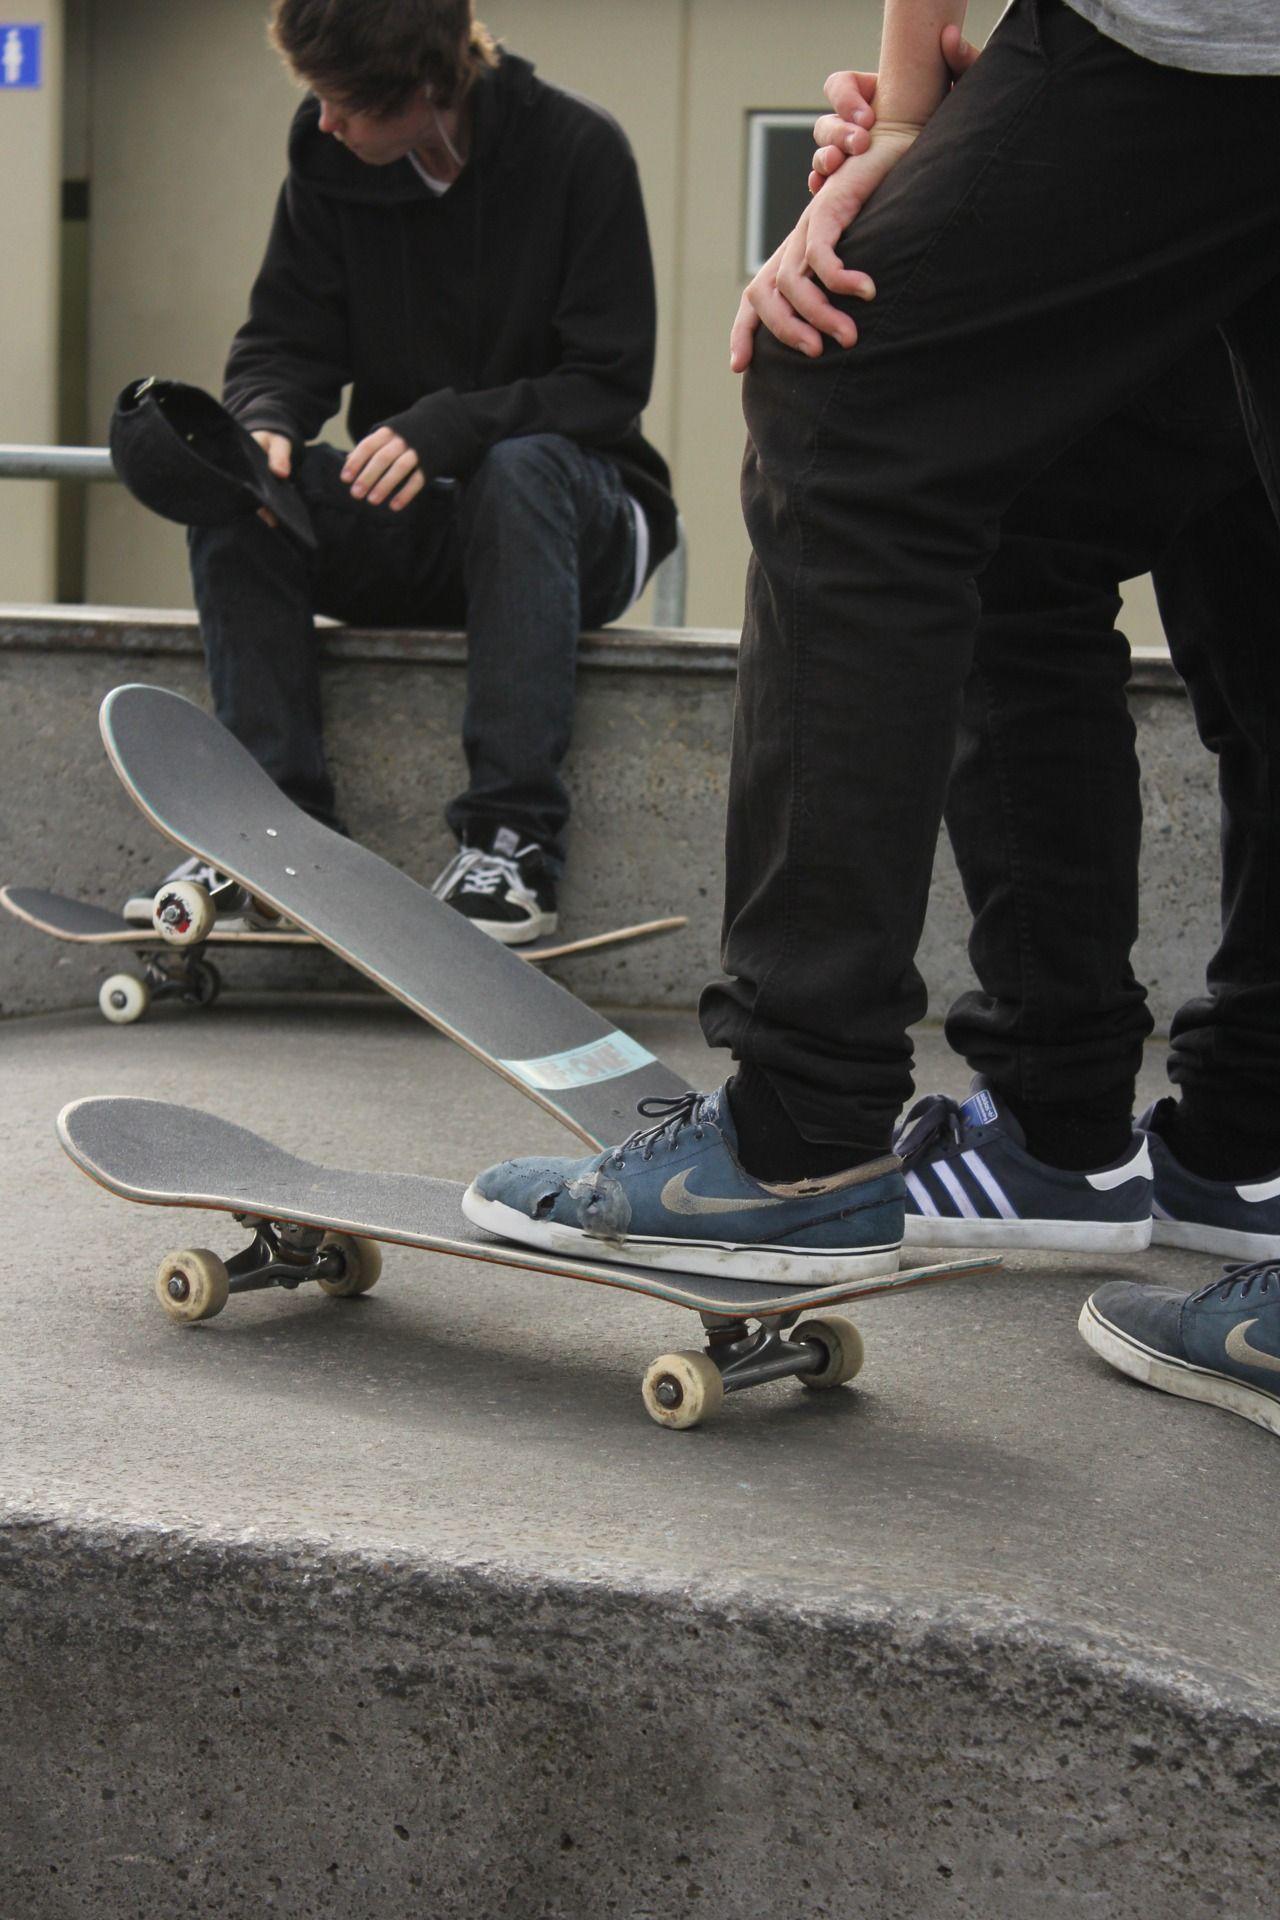 skaters Skate, Skateboard, Skateboard photography